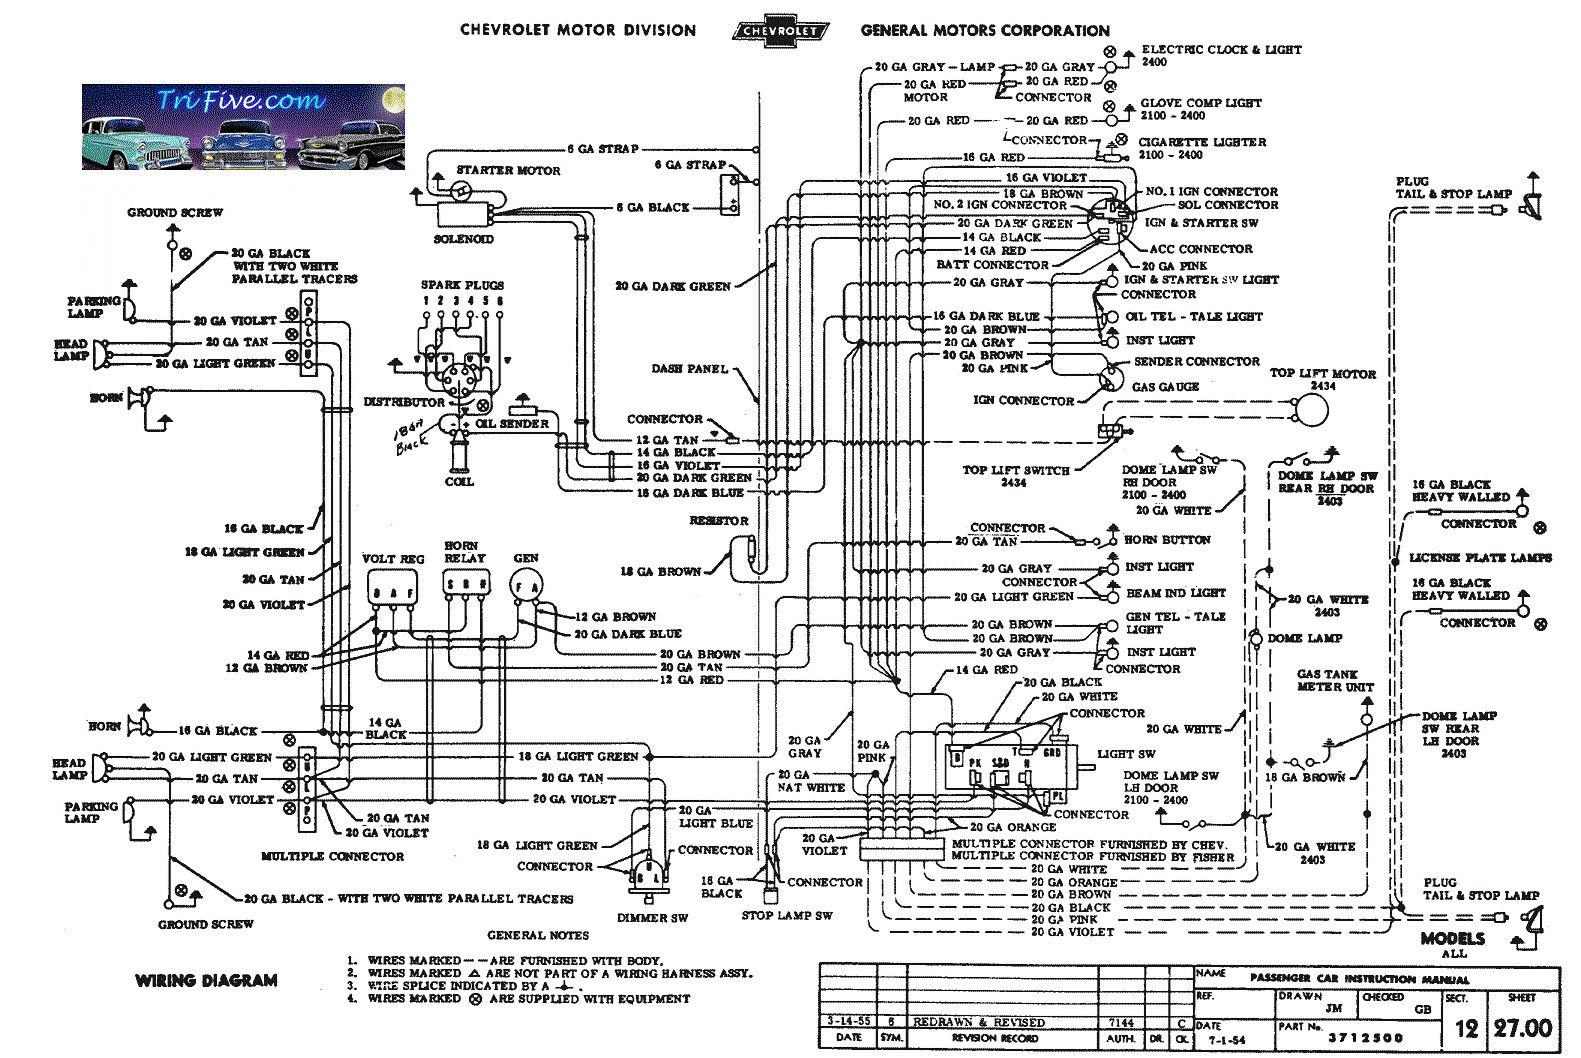 [DIAGRAM_5FD]  2008 Chevrolet Impala Engine Diagram - Wiring Diagrams   Chevrolet Impala Engine Diagram      karox.fr